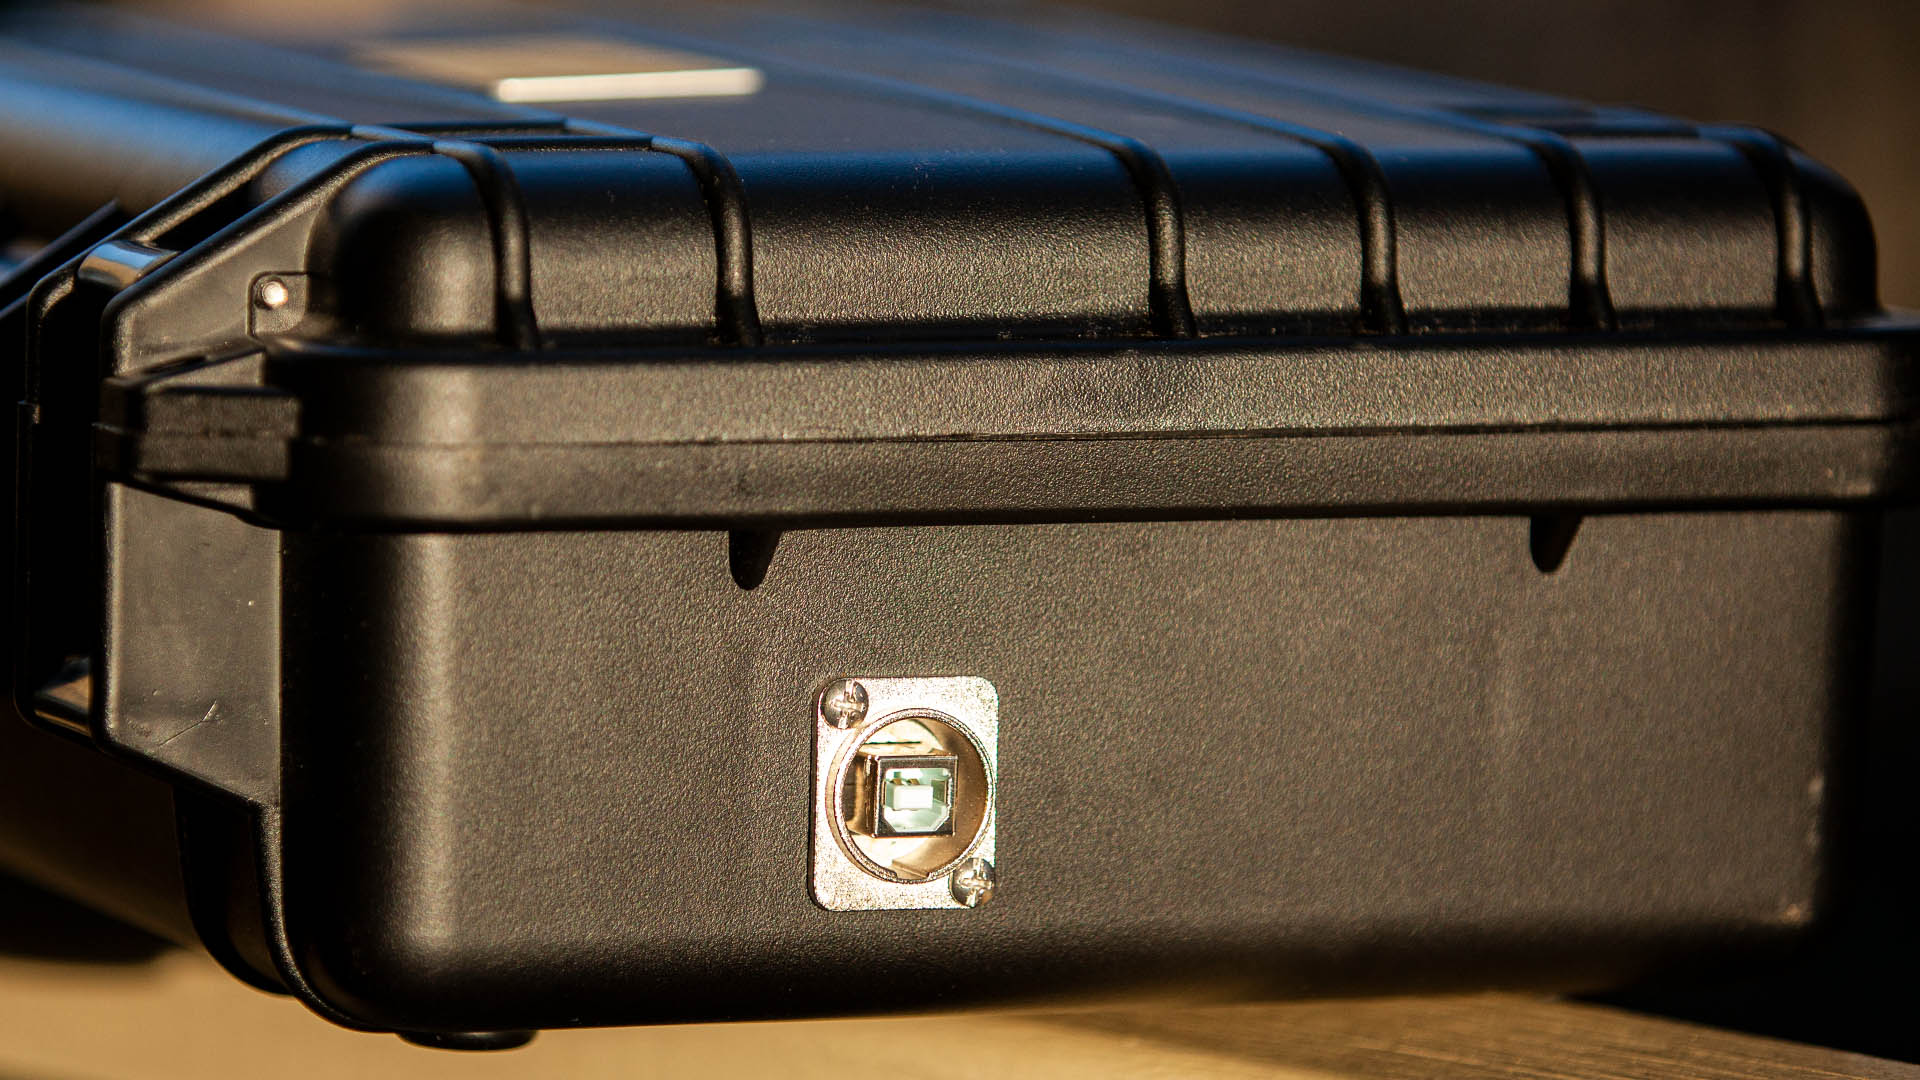 Icom IC-705 All Mode Transceiver USB Pelican Installation